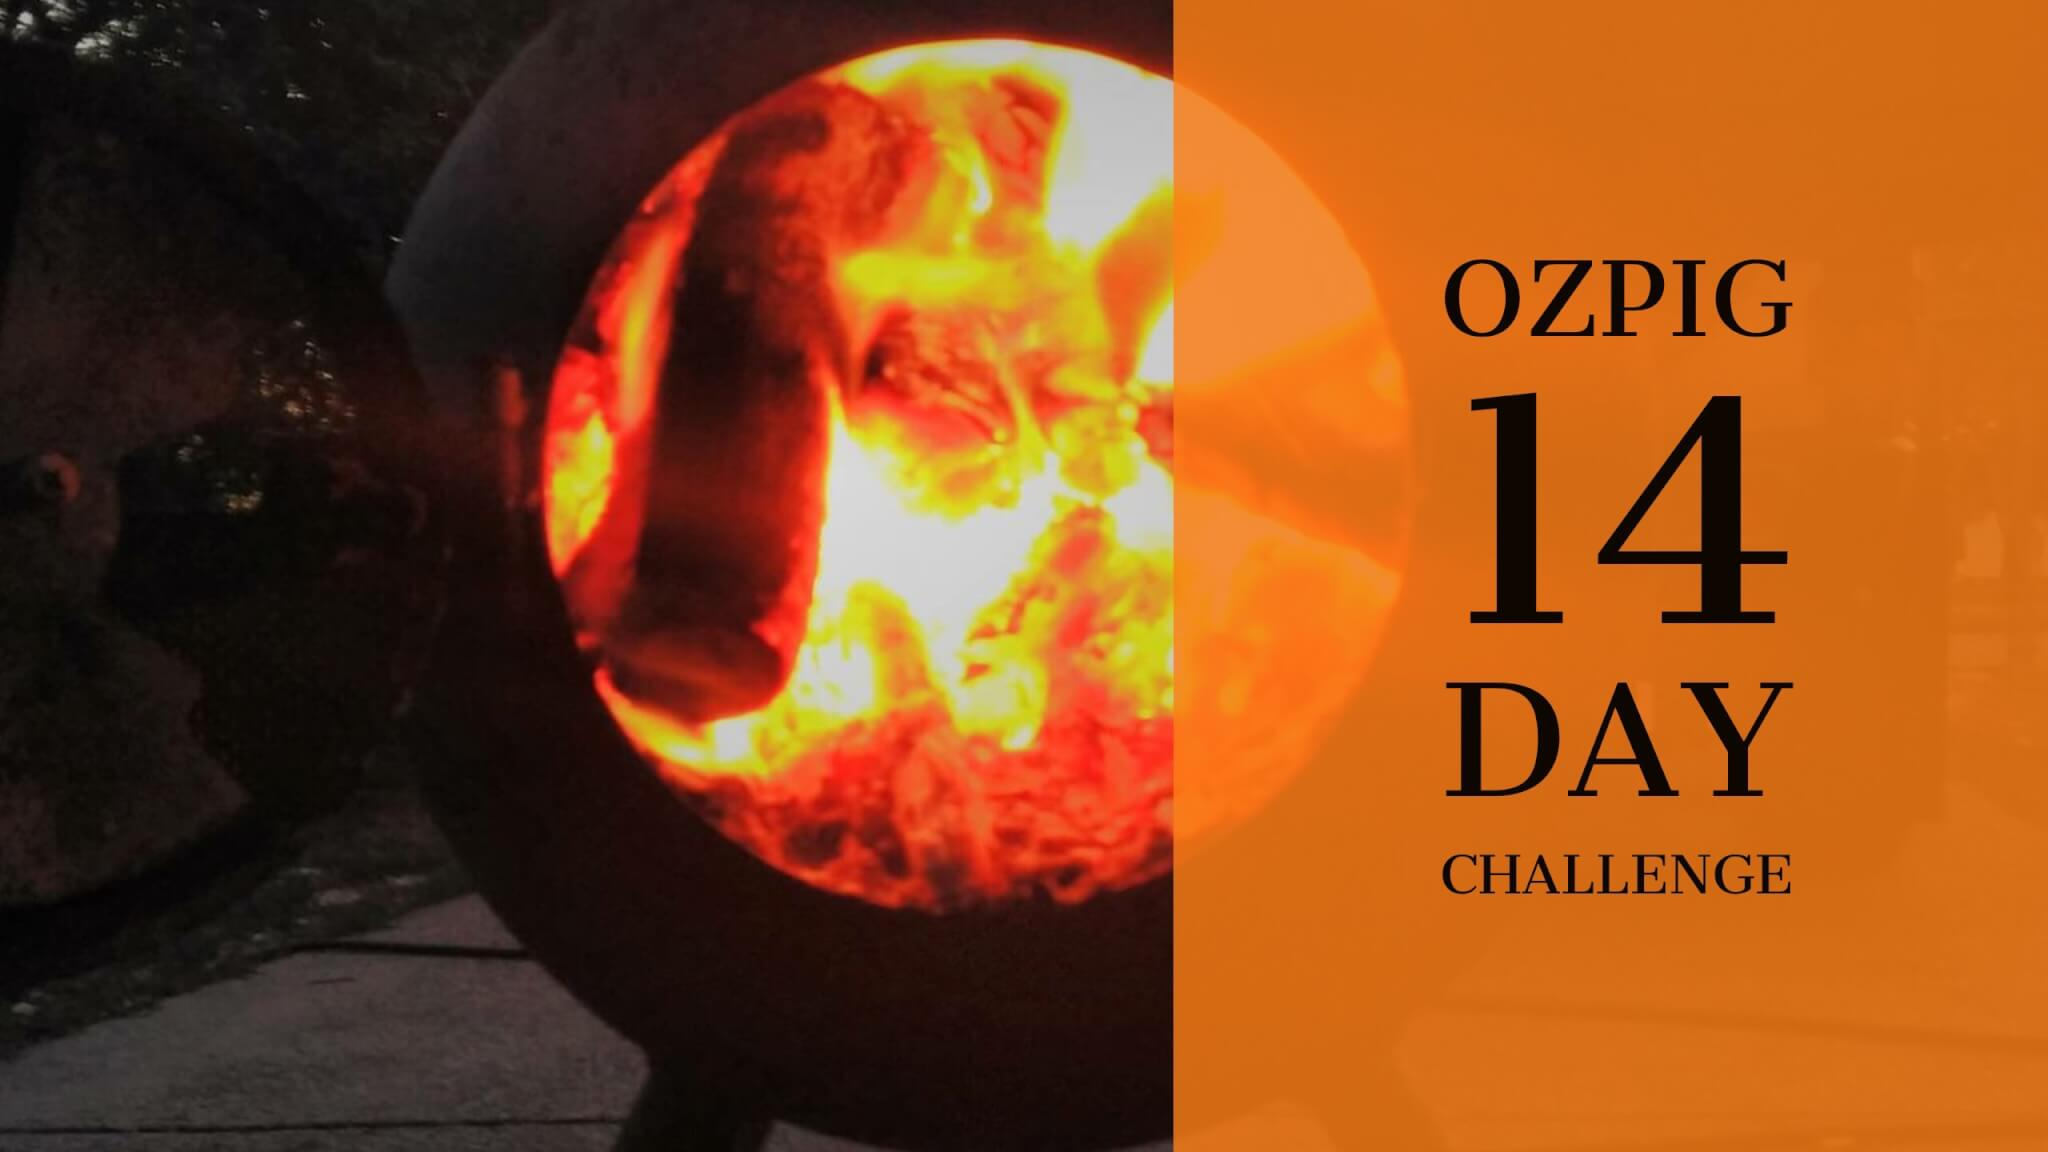 Ozpig 14 Day Challenge | 2017